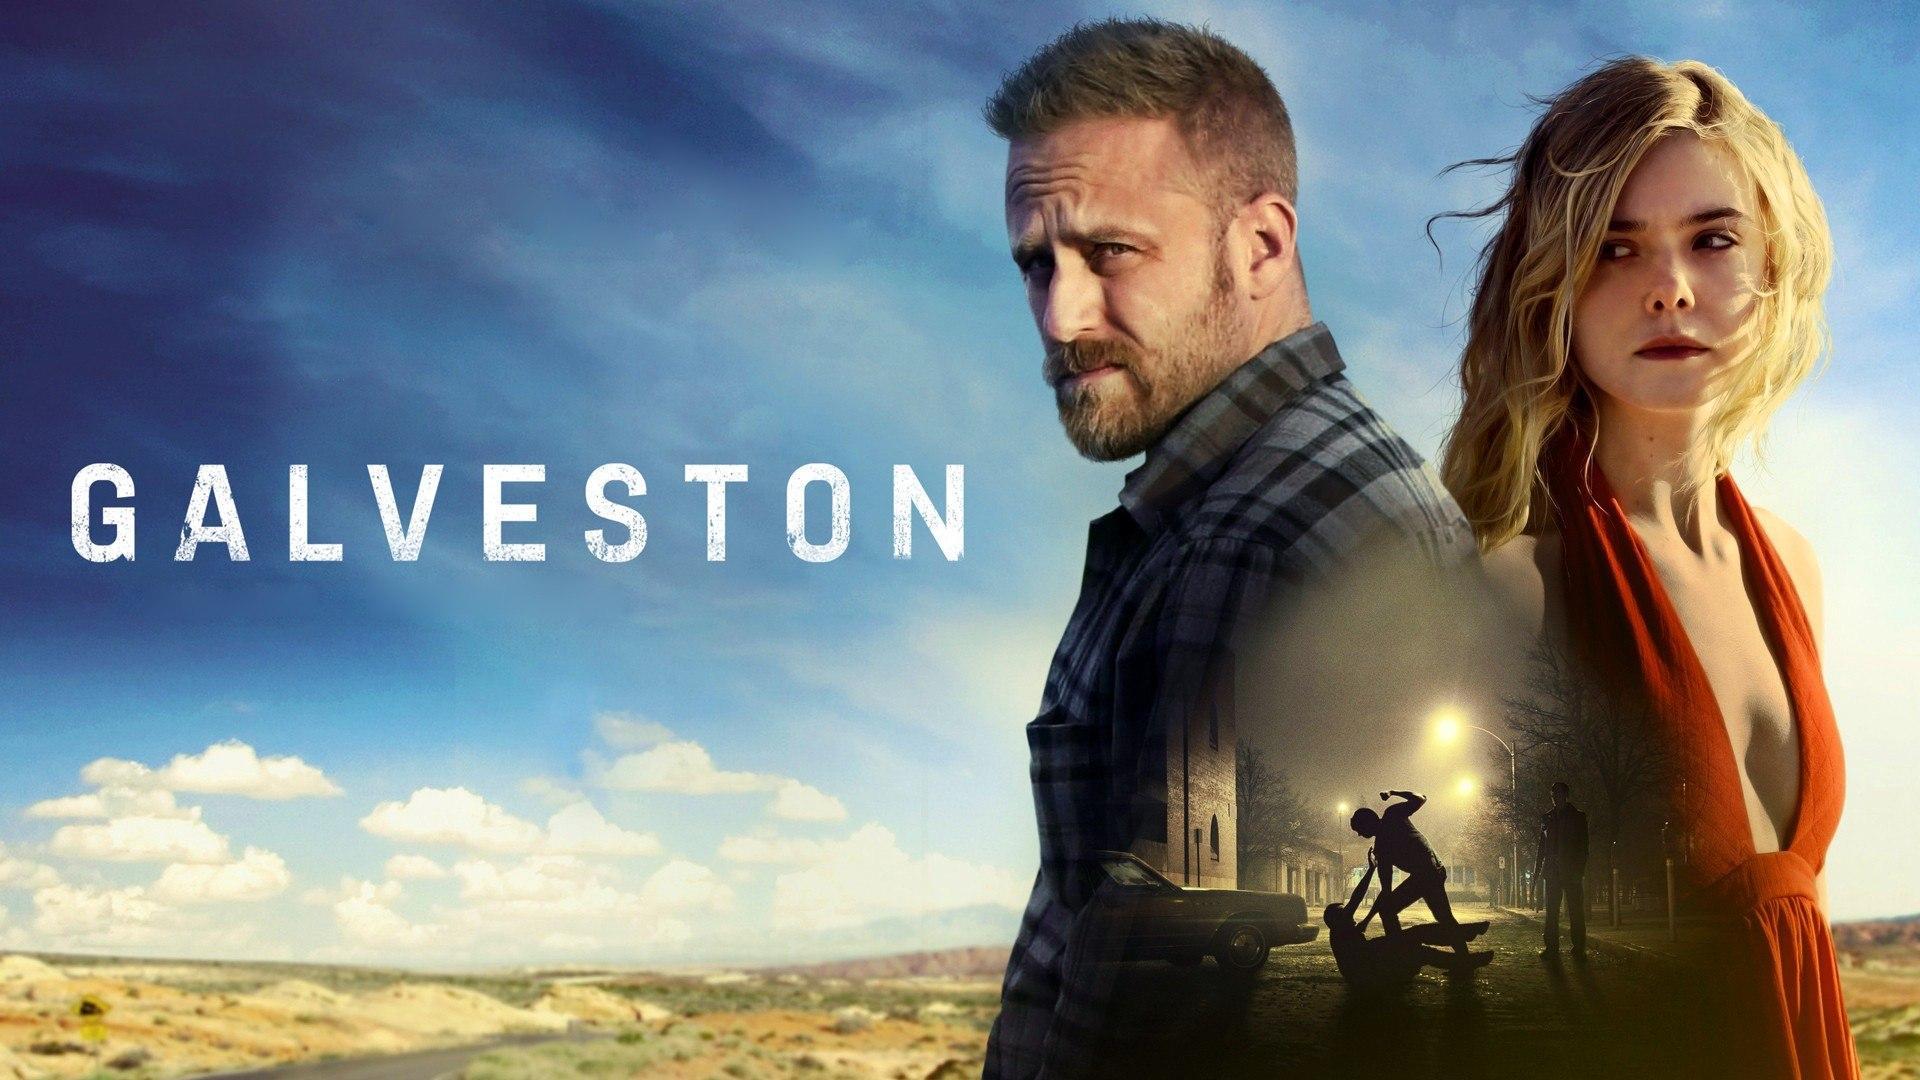 Giovedi 5 Novembre 2020 Sky e Premium Cinema, Galveston